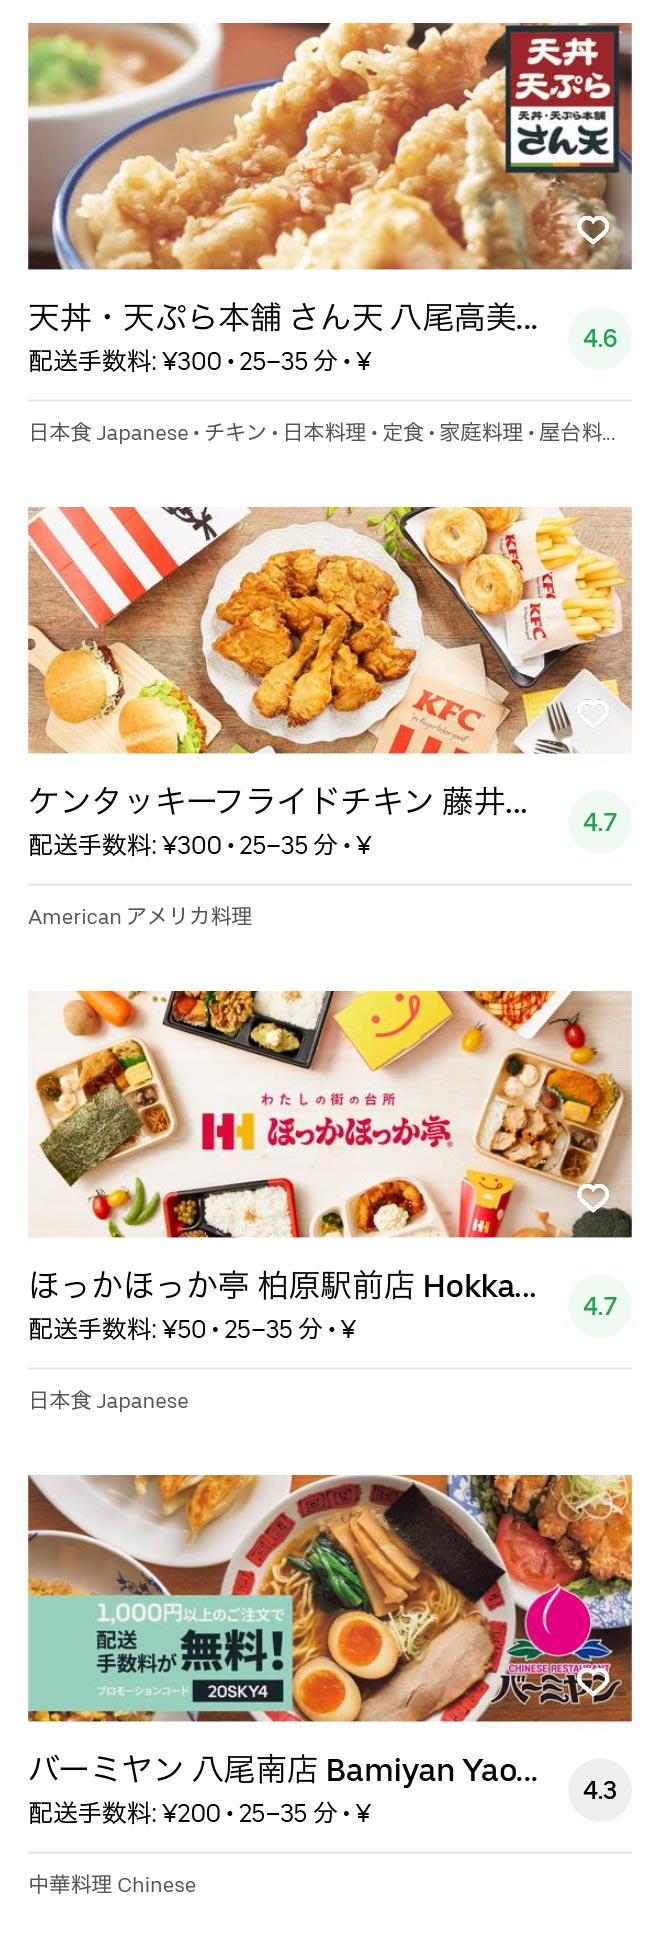 Kashiwara menu 2005 01